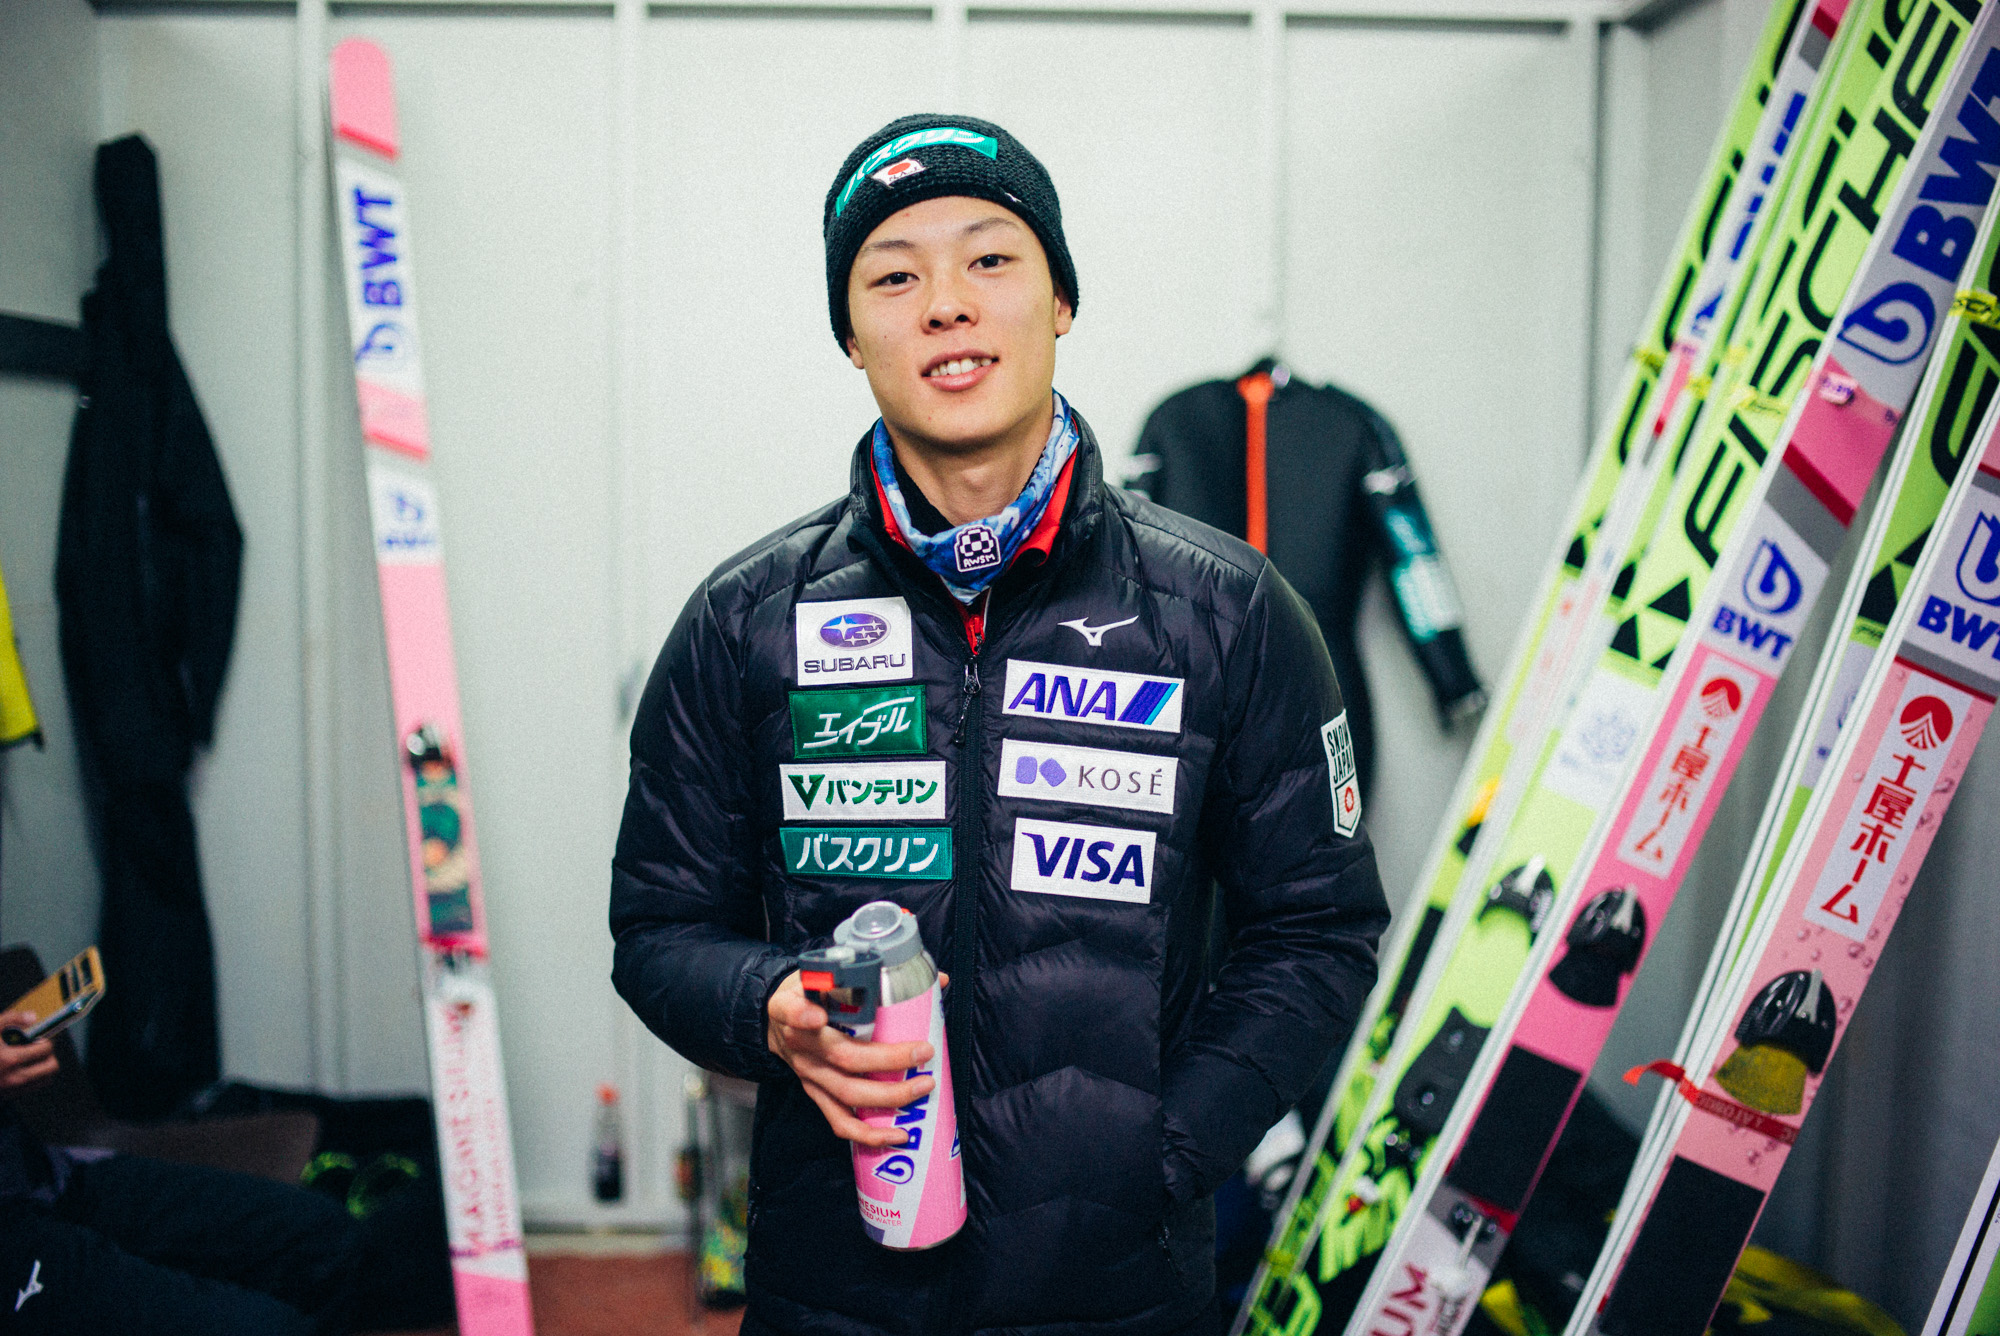 greta-horsch_bwt_ski-jumping_max-threlfall_11